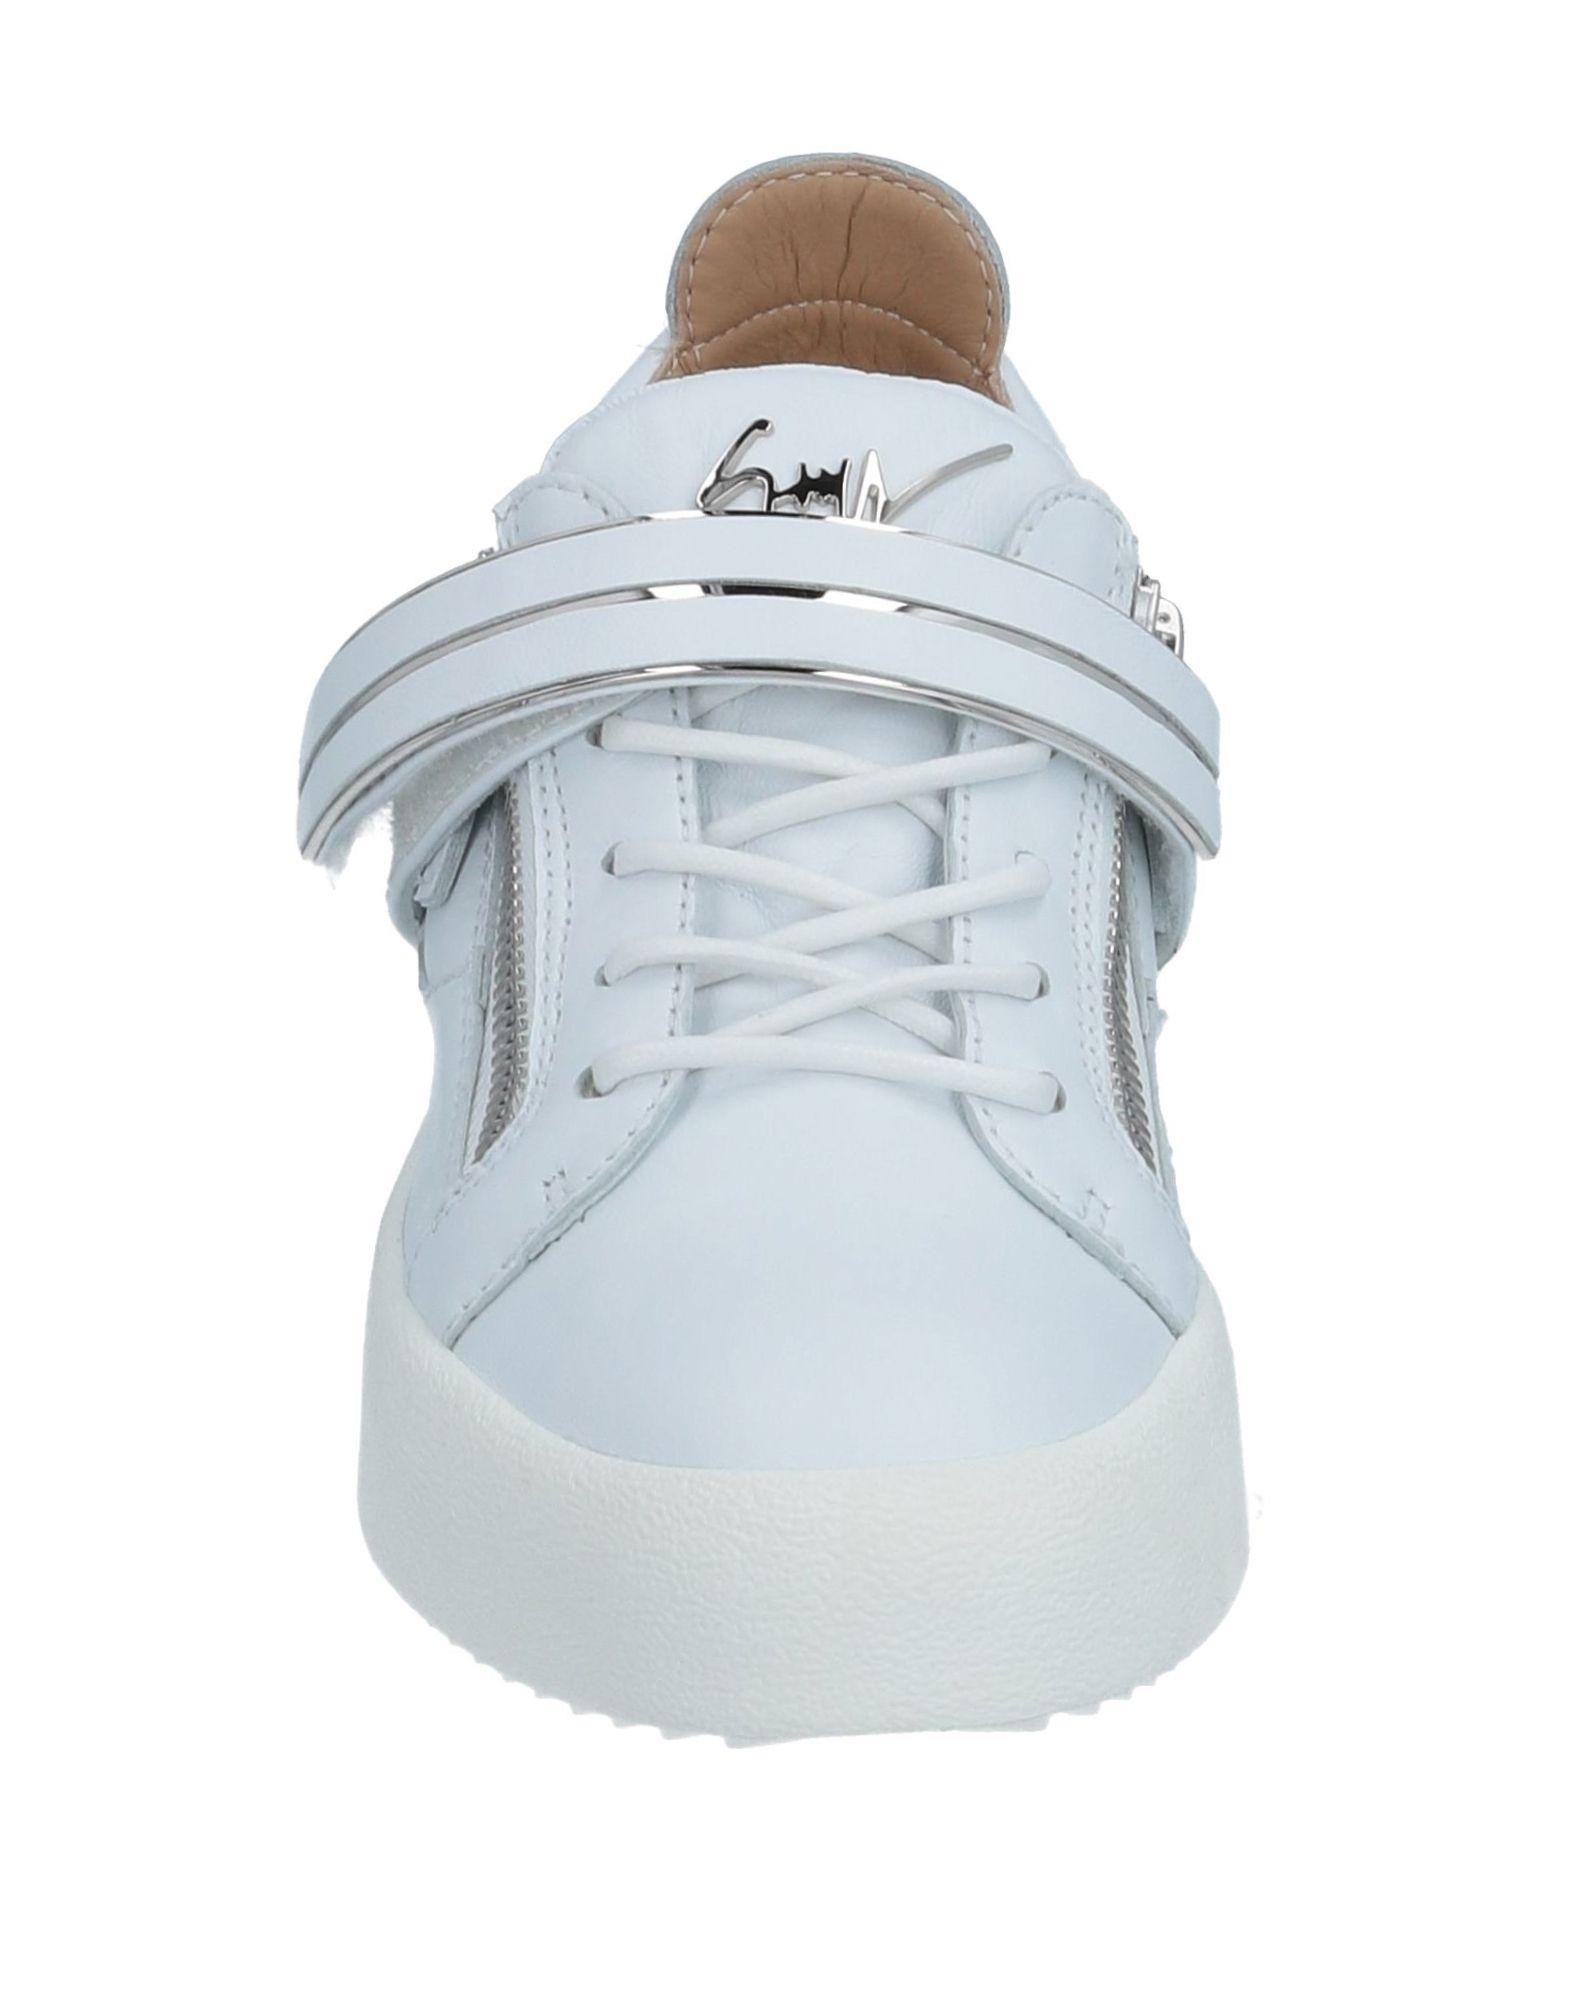 Giuseppe Zanotti Gute Sneakers Herren  11517746PB Gute Zanotti Qualität beliebte Schuhe fe4619